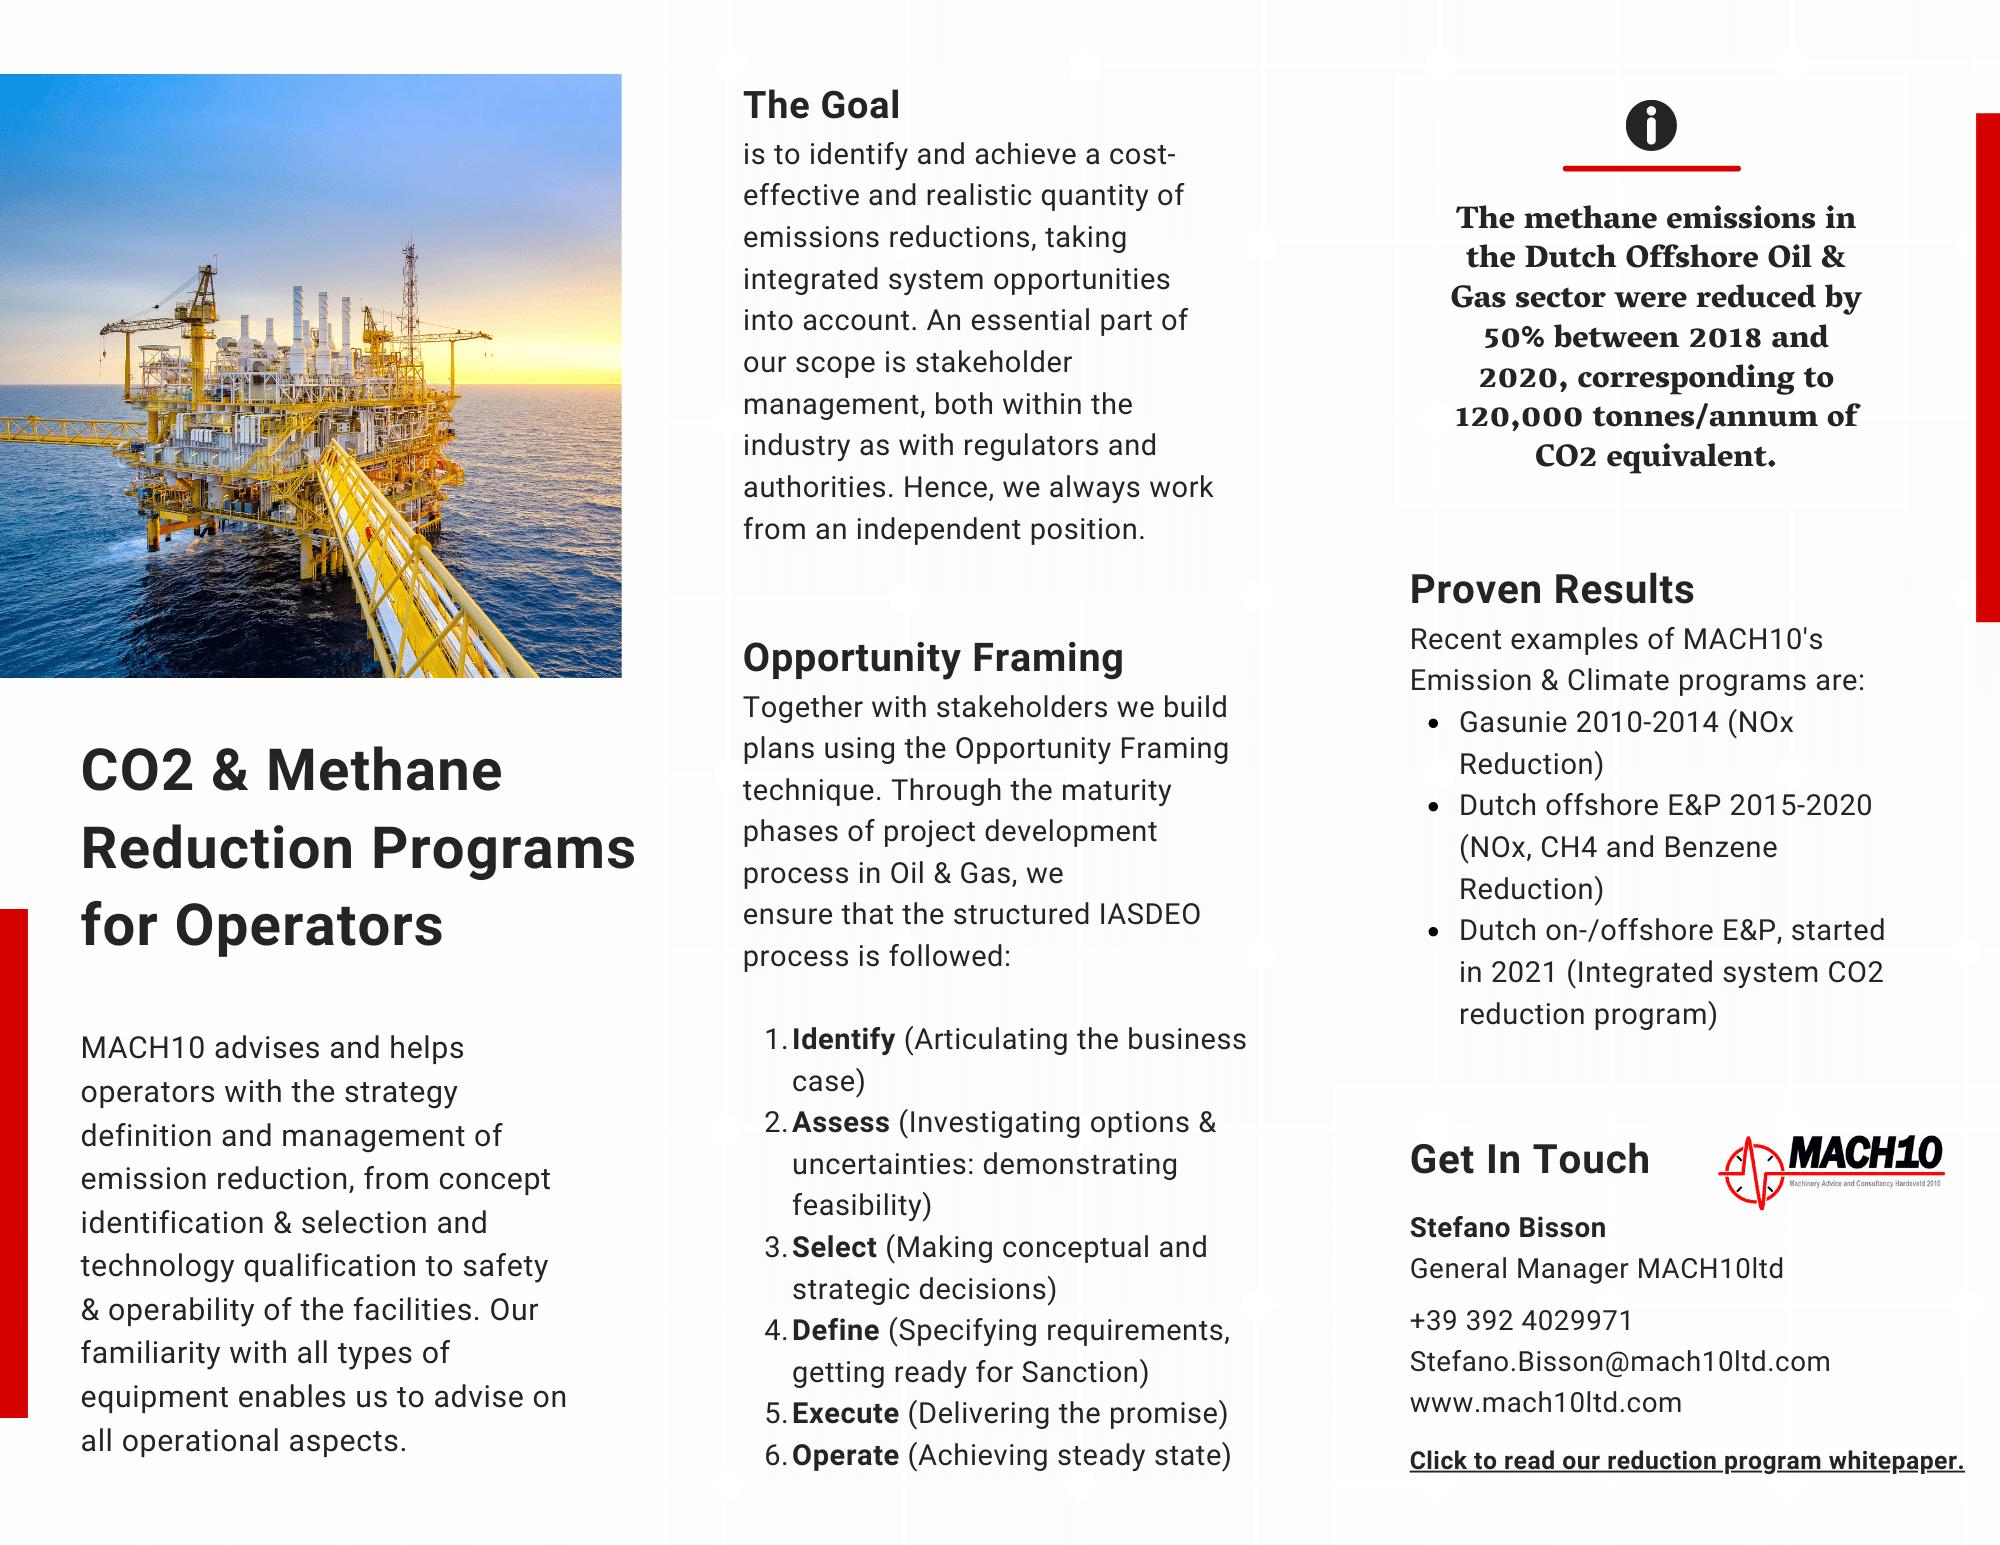 CO2 & Methane Reduction Programs for Operators